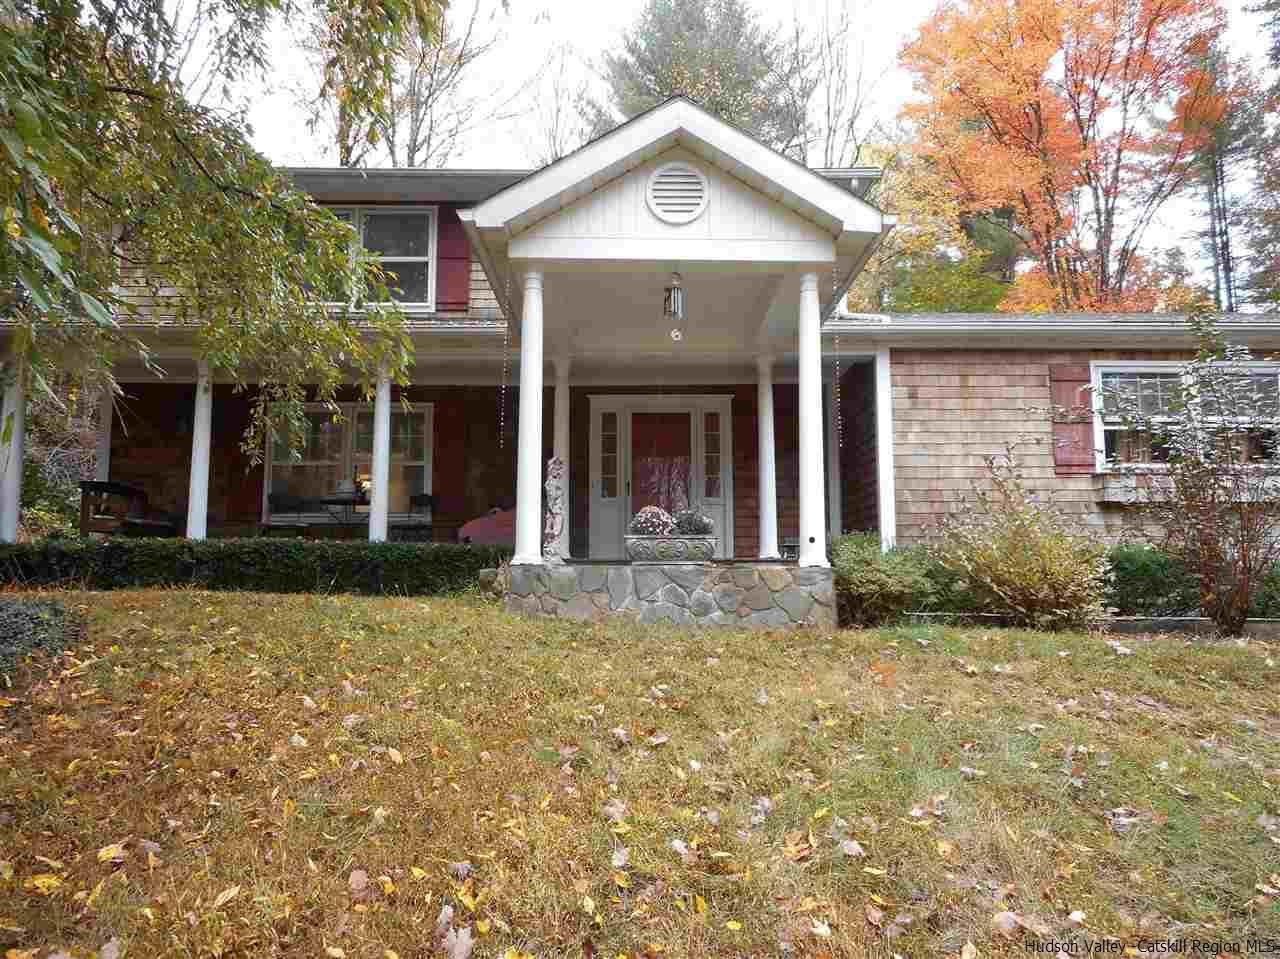 Single Family Home for Sale at 16 DuBoise Lane 16 DuBoise Lane New Paltz, New York 12561 United States